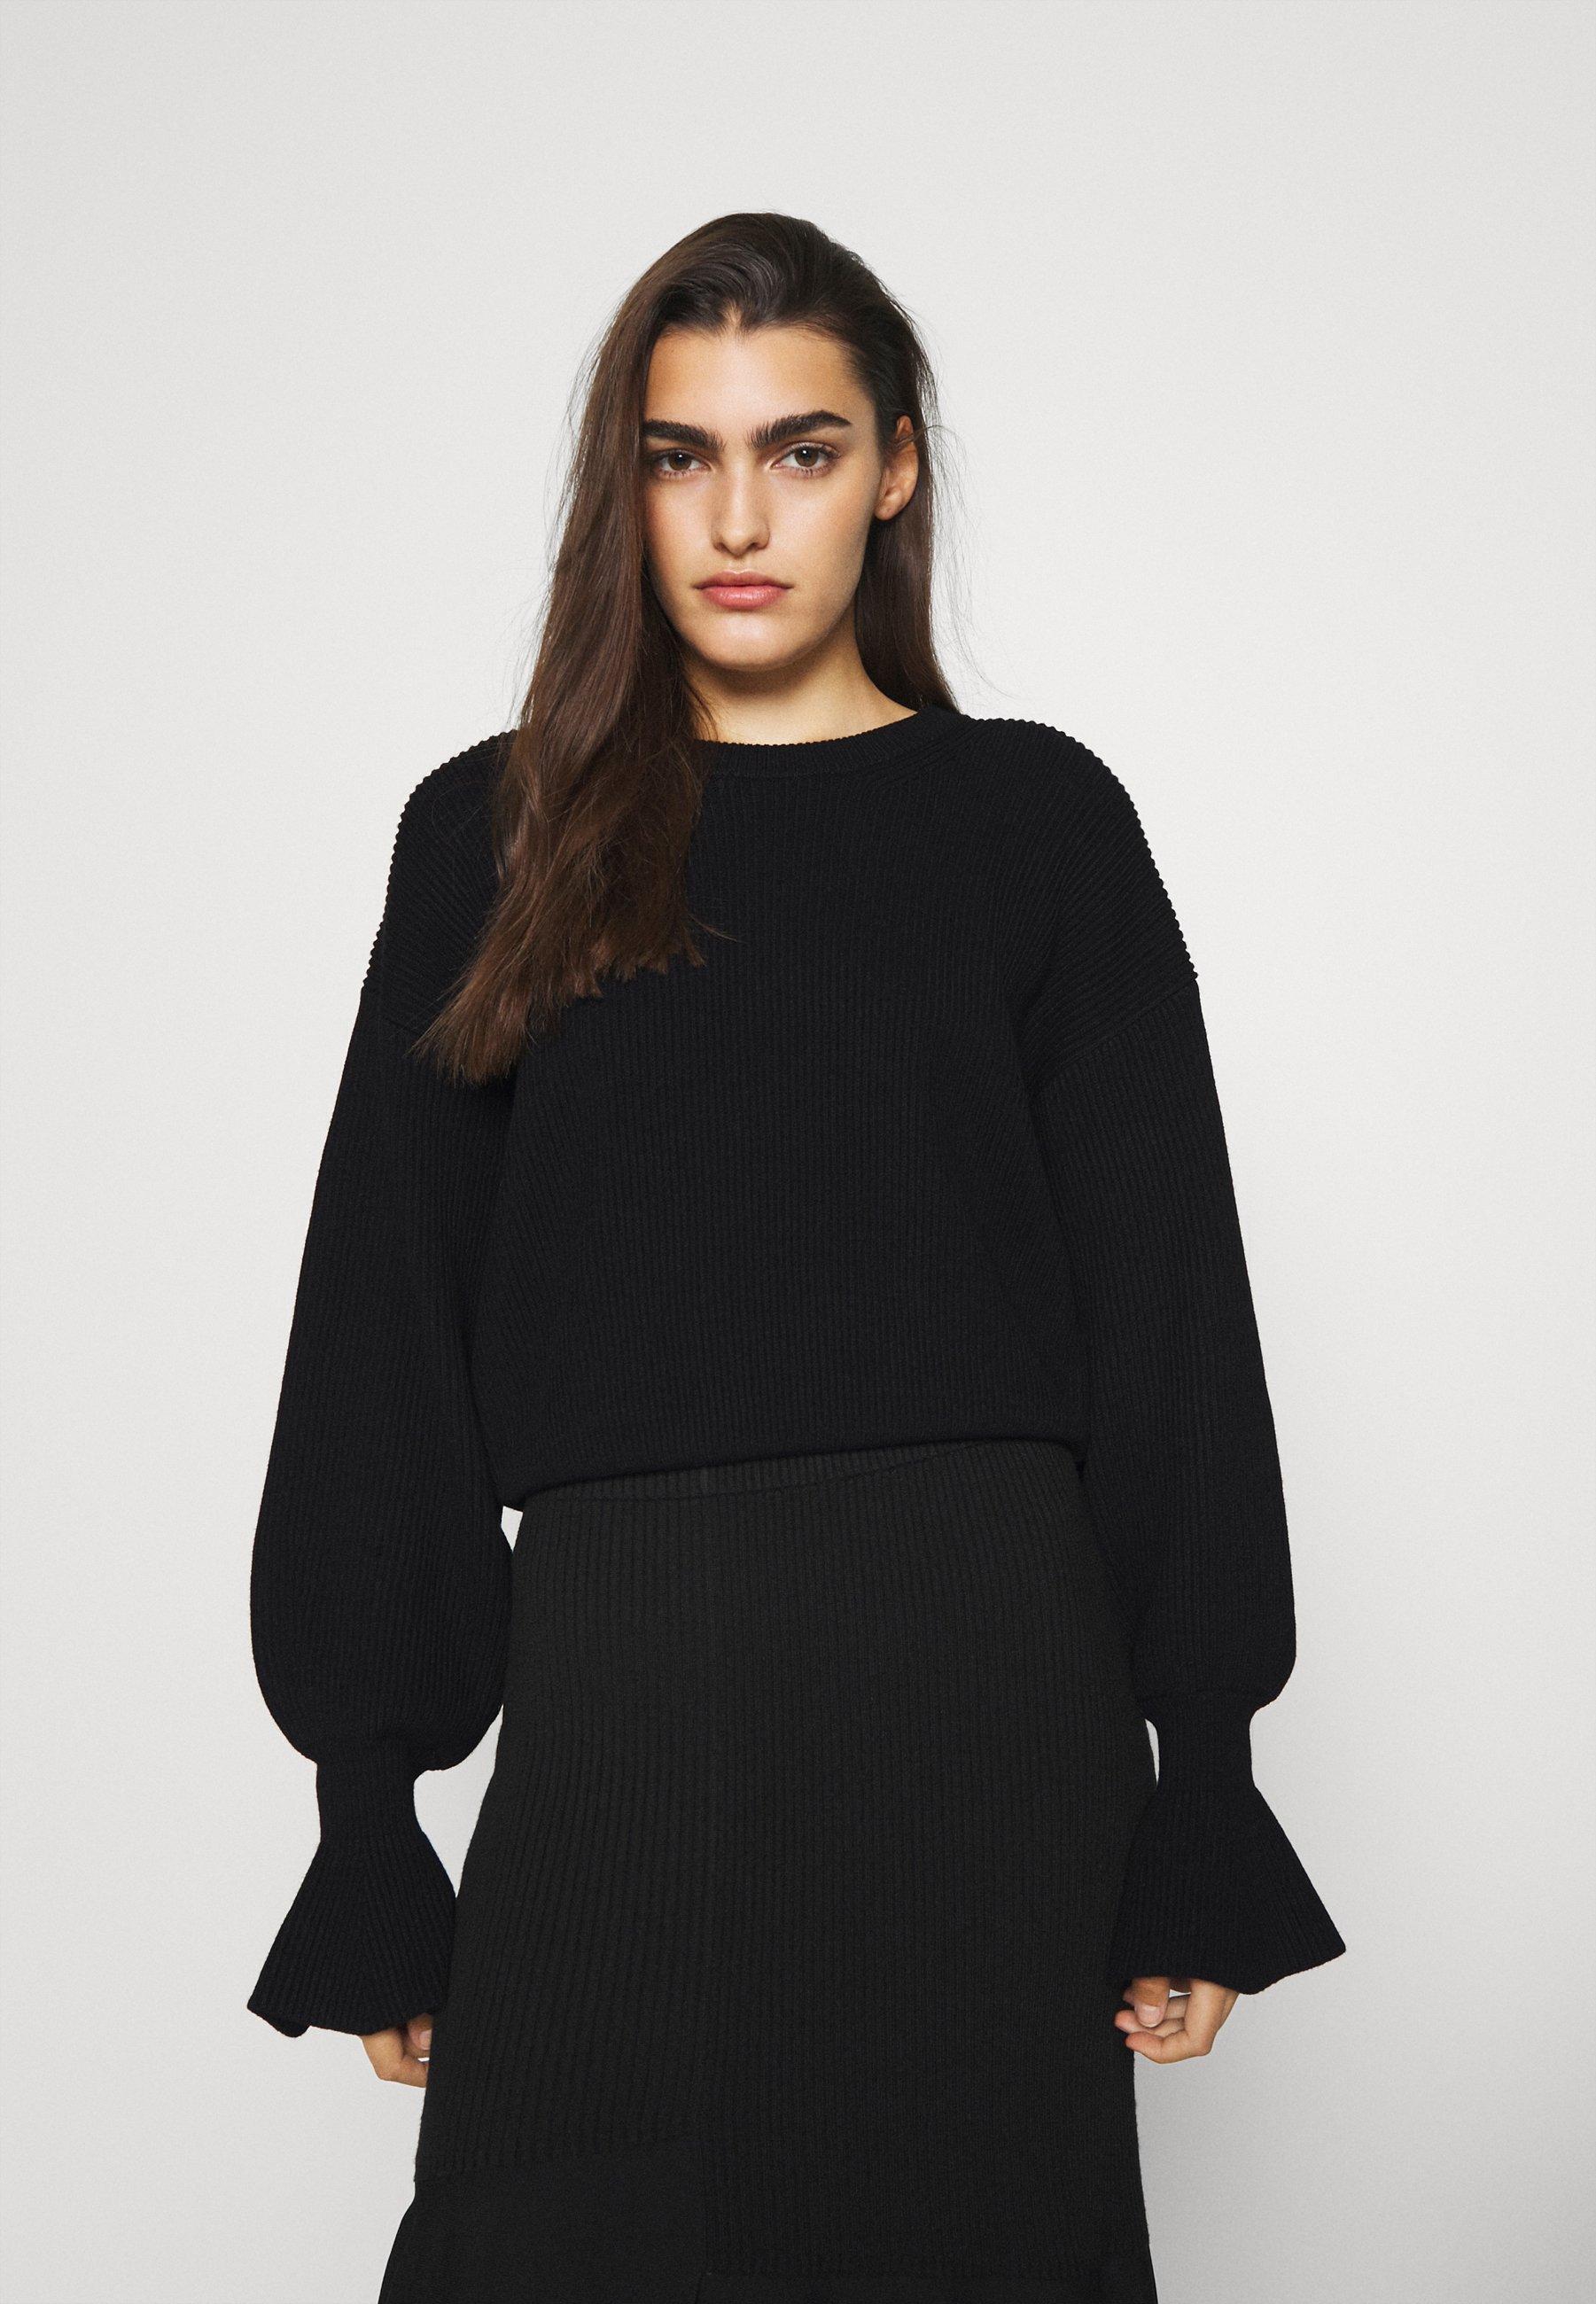 100% Guaranteed Recommend Discount Women's Clothing DESIGNERS REMIX MANDY SLEEVE Jumper black 6GFGAjDie UY54bkpK5